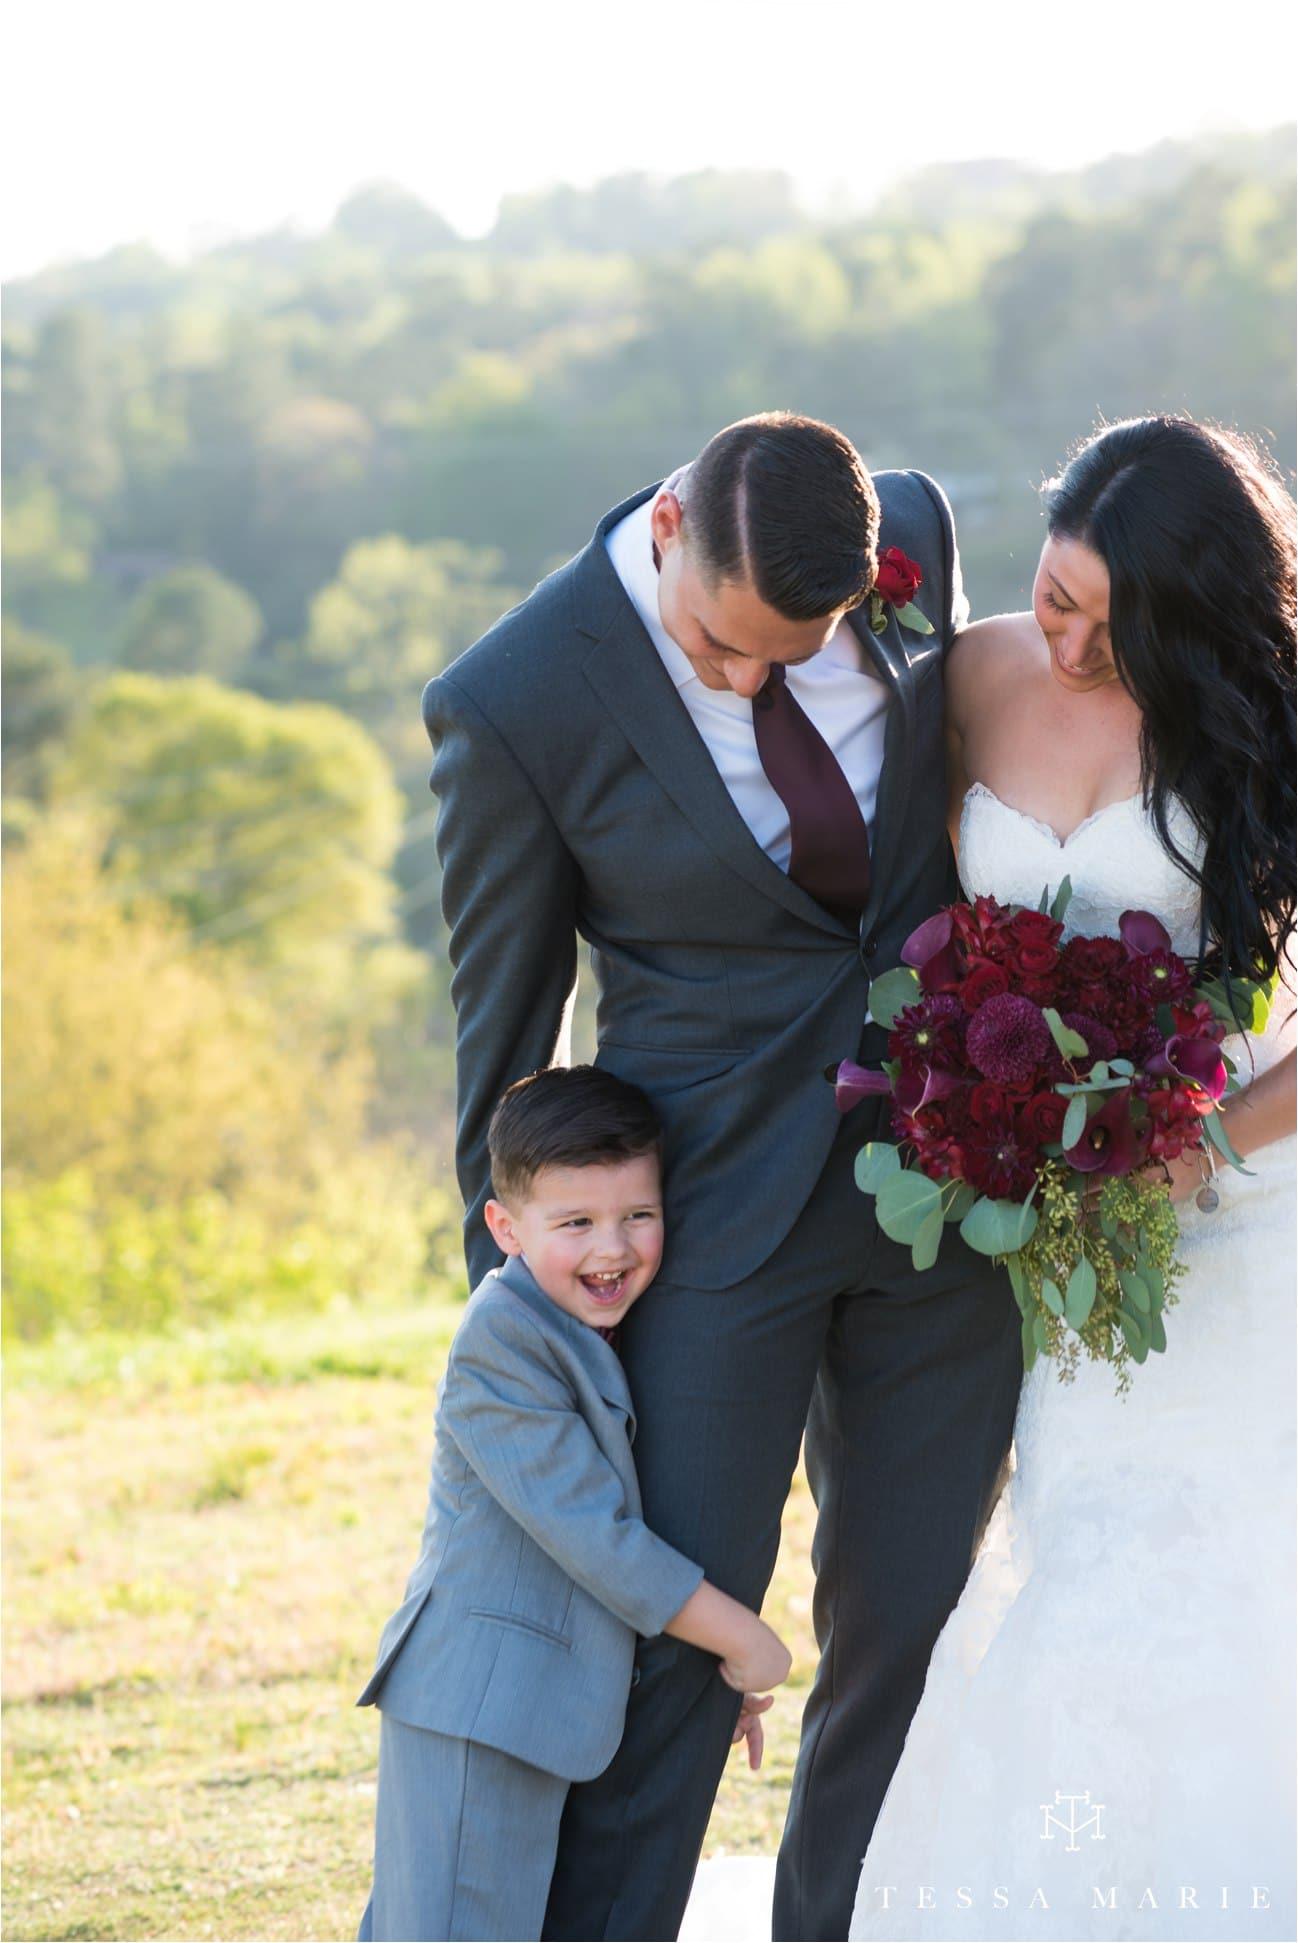 tessa_marie_weddings_rivermill_event_centere_candid_outdoor_wedding_photos_0252